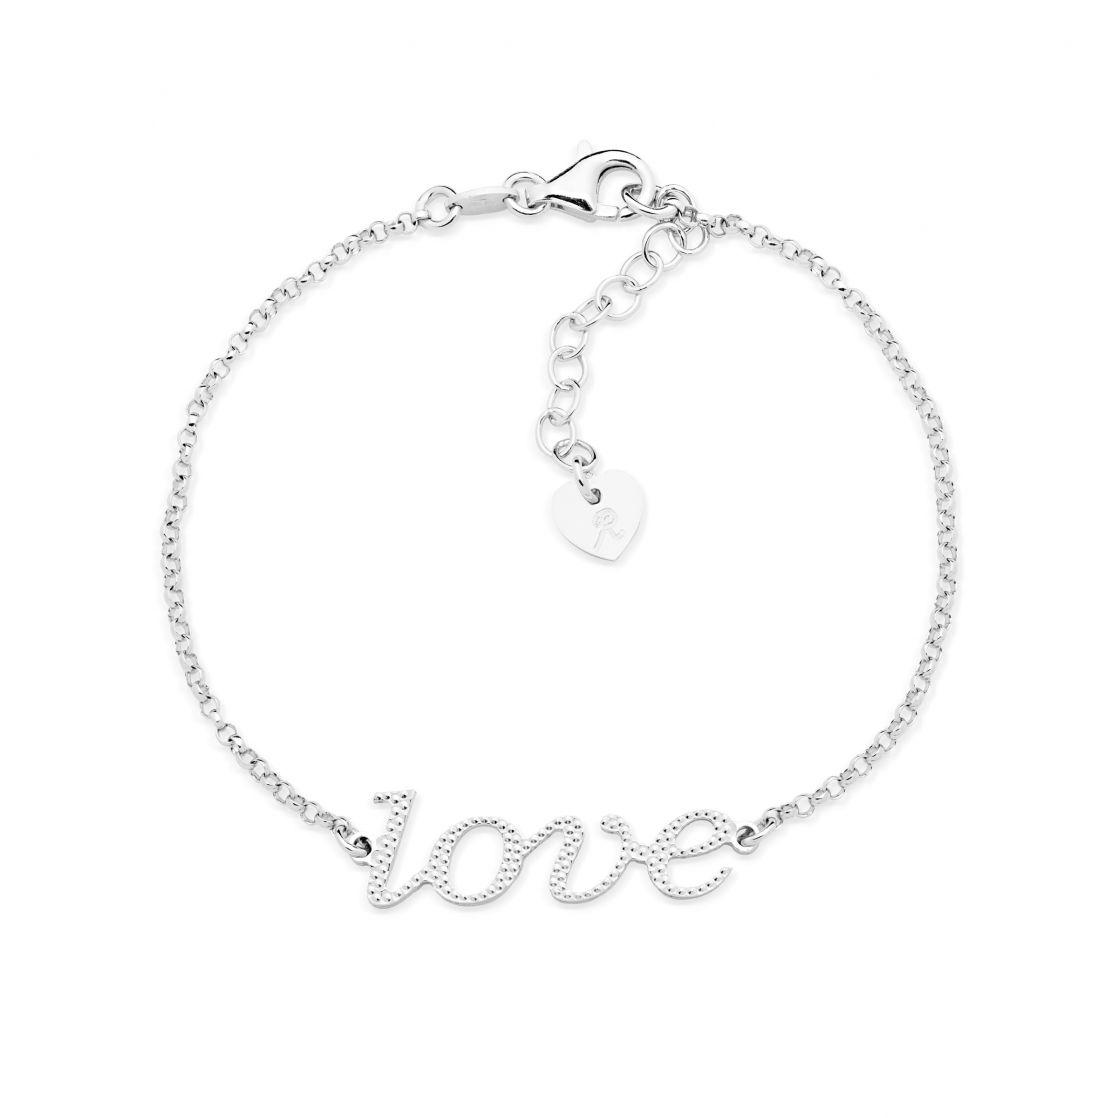 Bracelet with love element